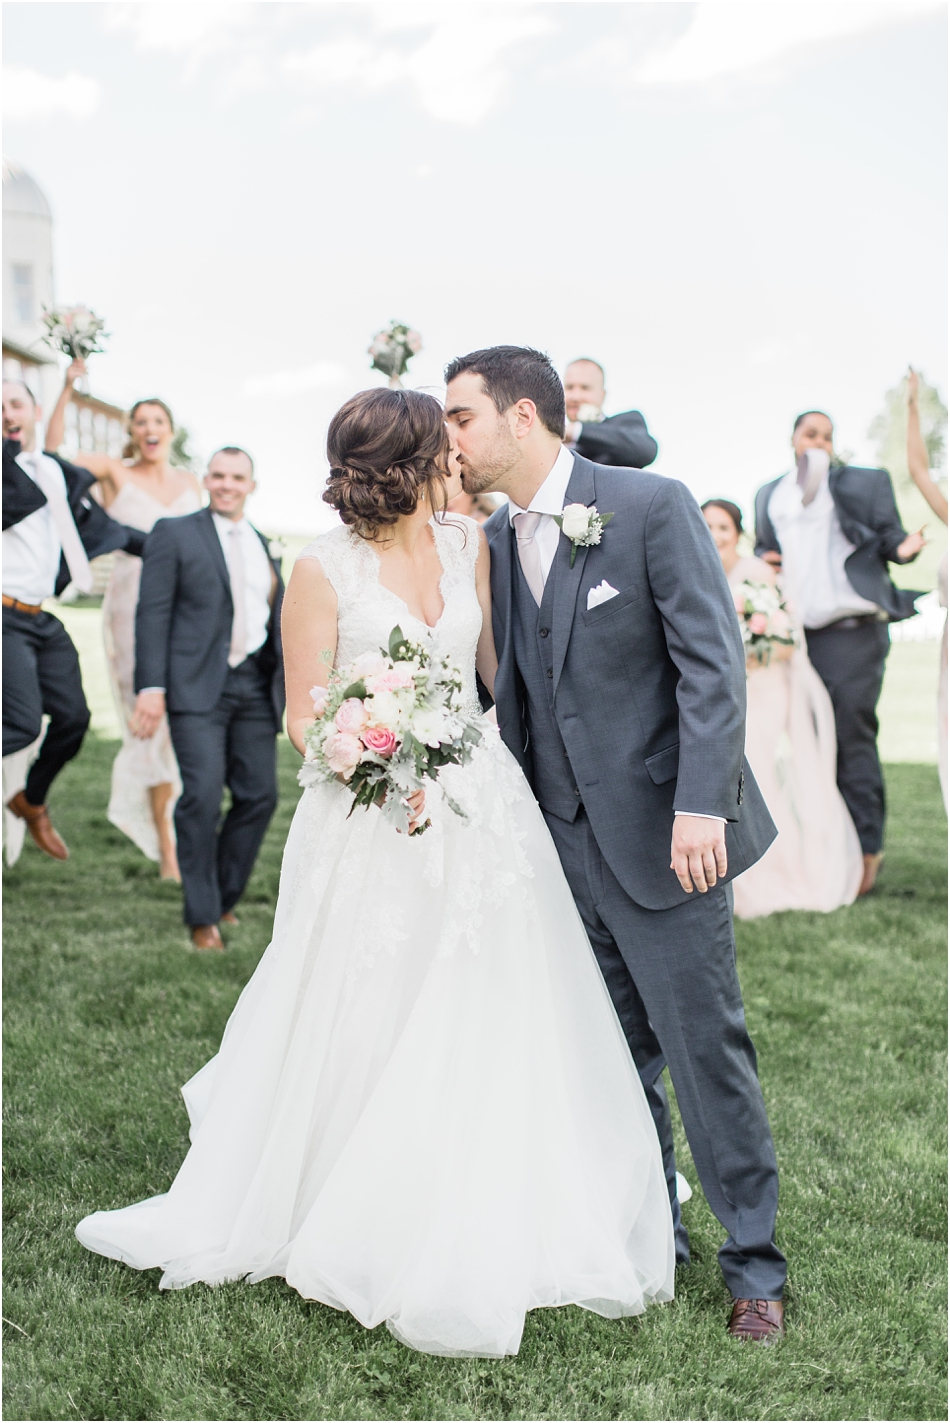 barn_at_gibbett_hill_groton_boston_massachusetts_cape_cod_new_england_wedding_photographer_Meredith_Jane_Photography_photo_1528.jpg